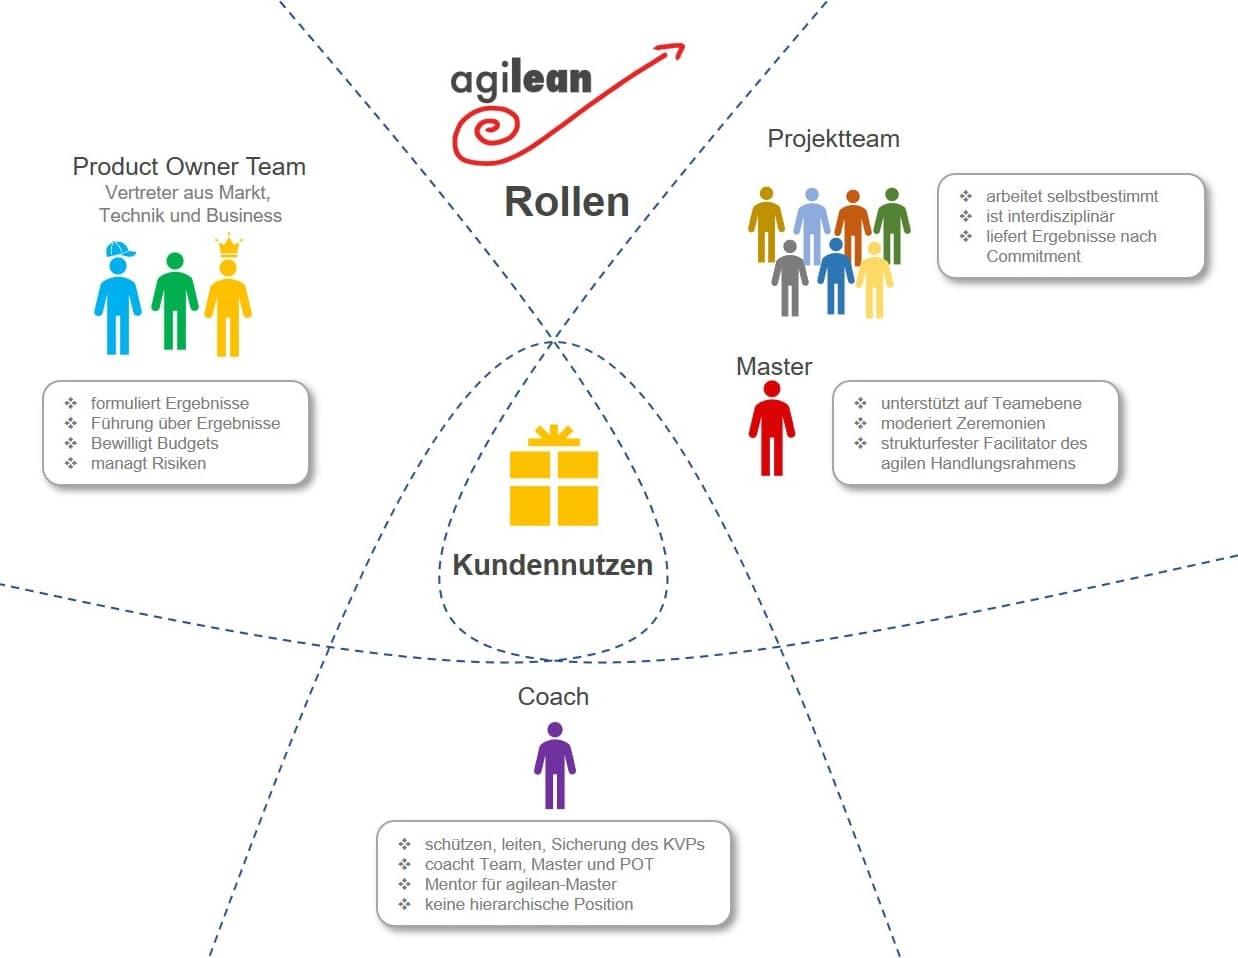 Agilean Rollen